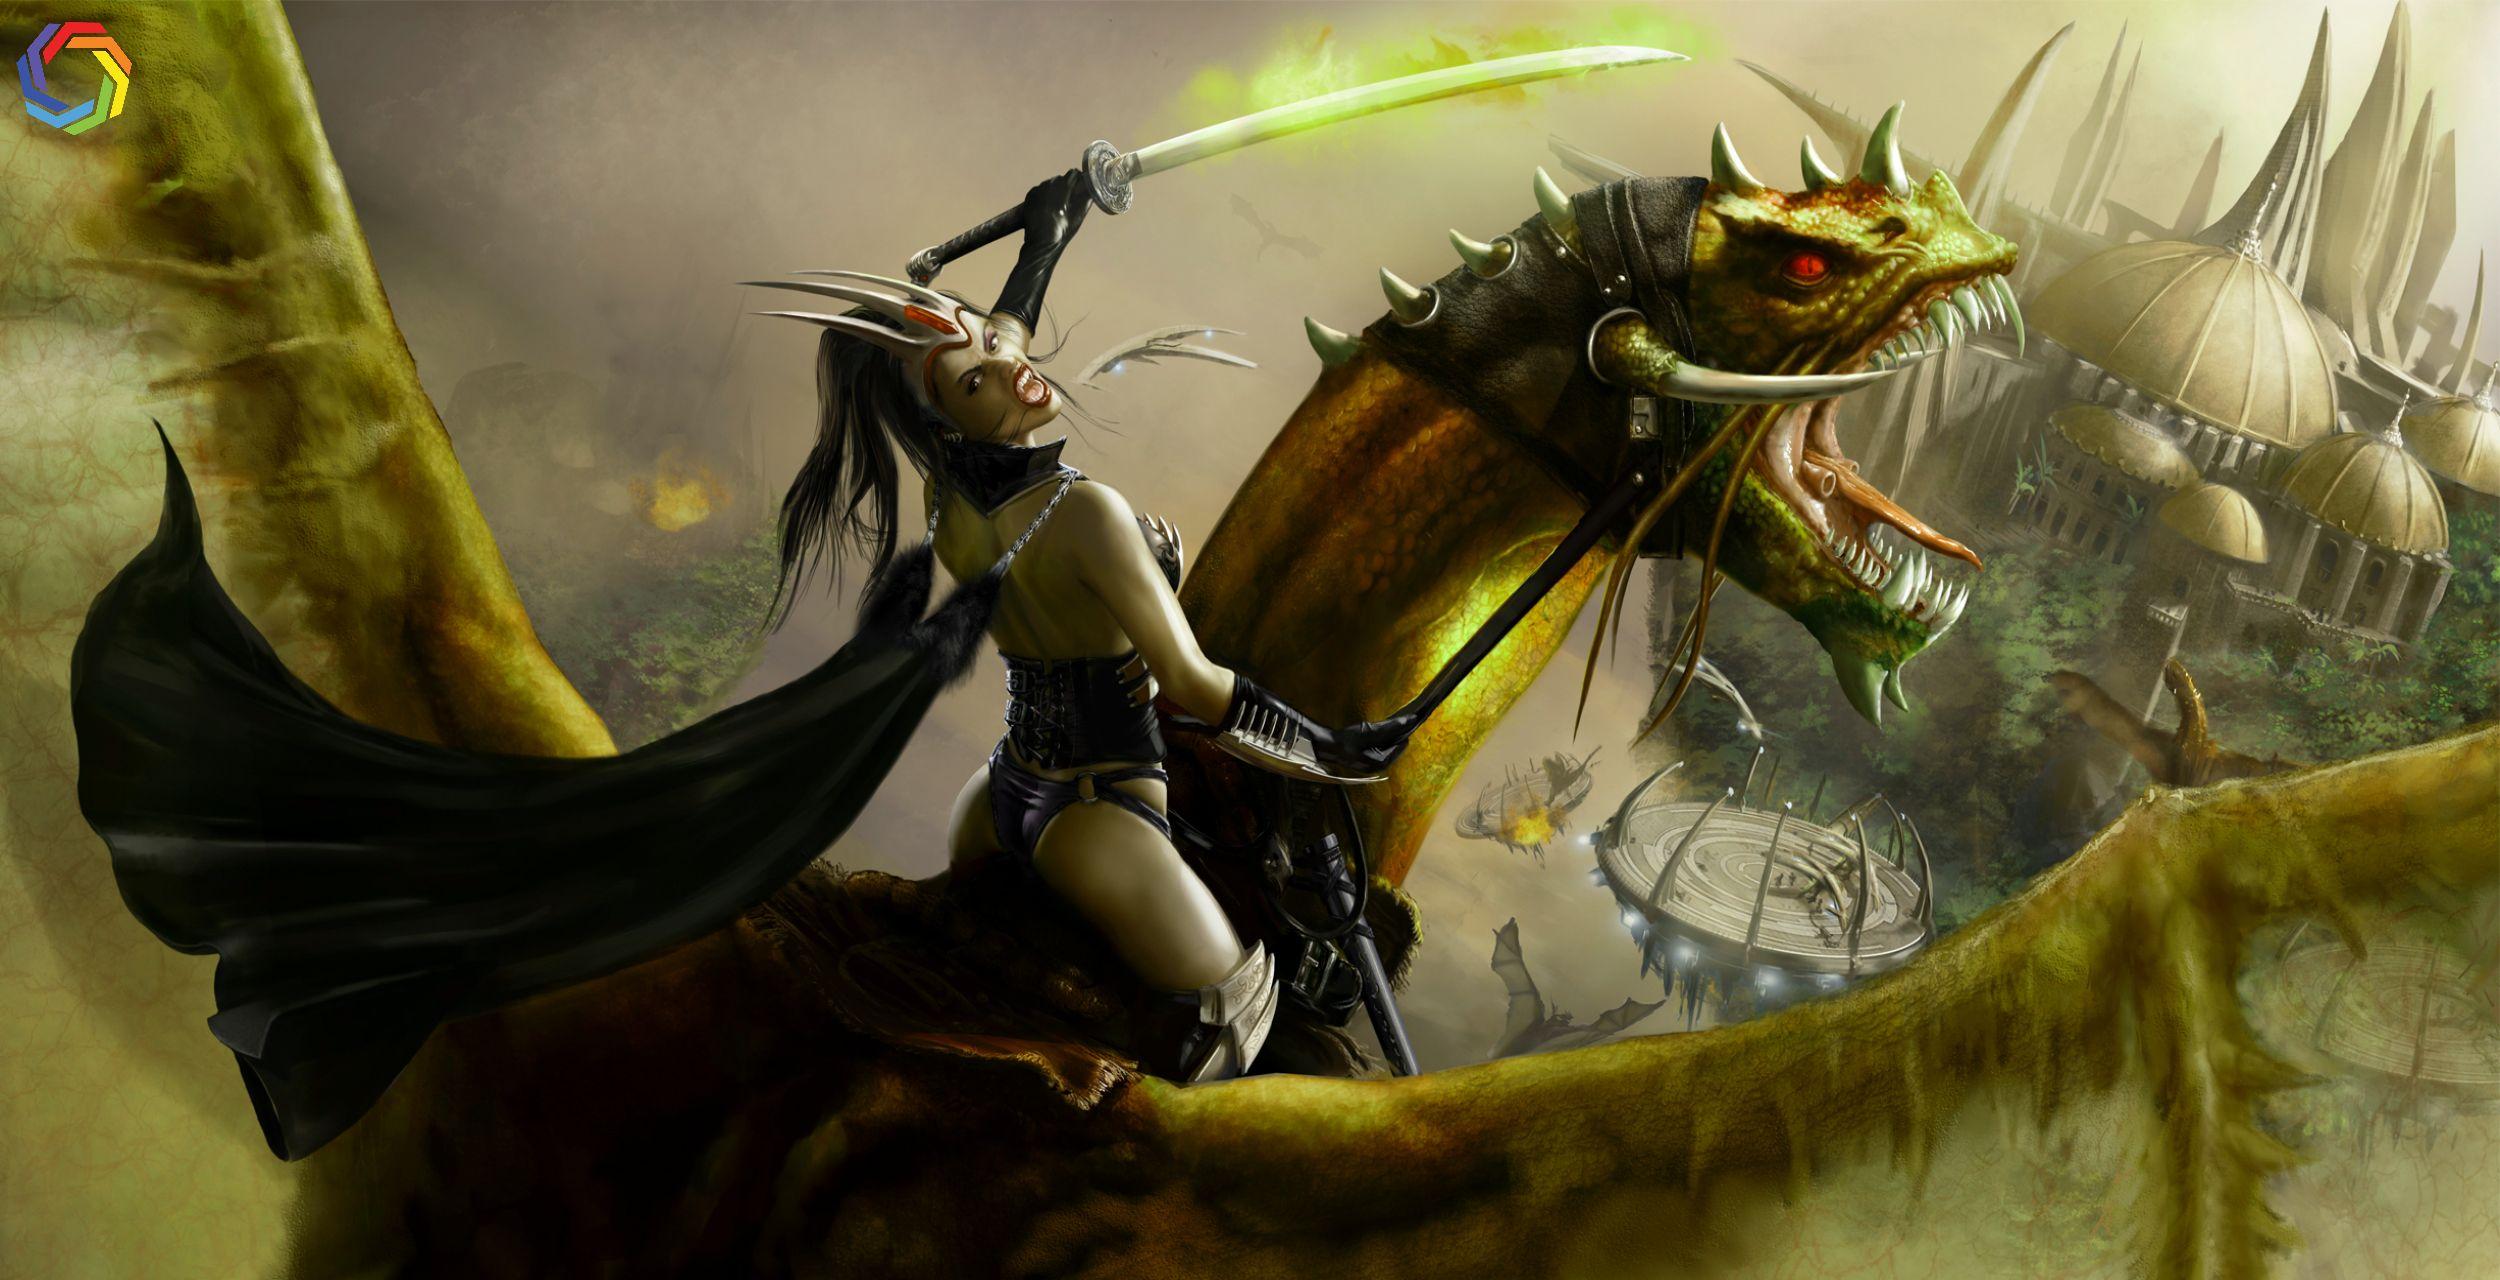 Download Wallpaper Anime Hd Attack Titan HD Widescreen